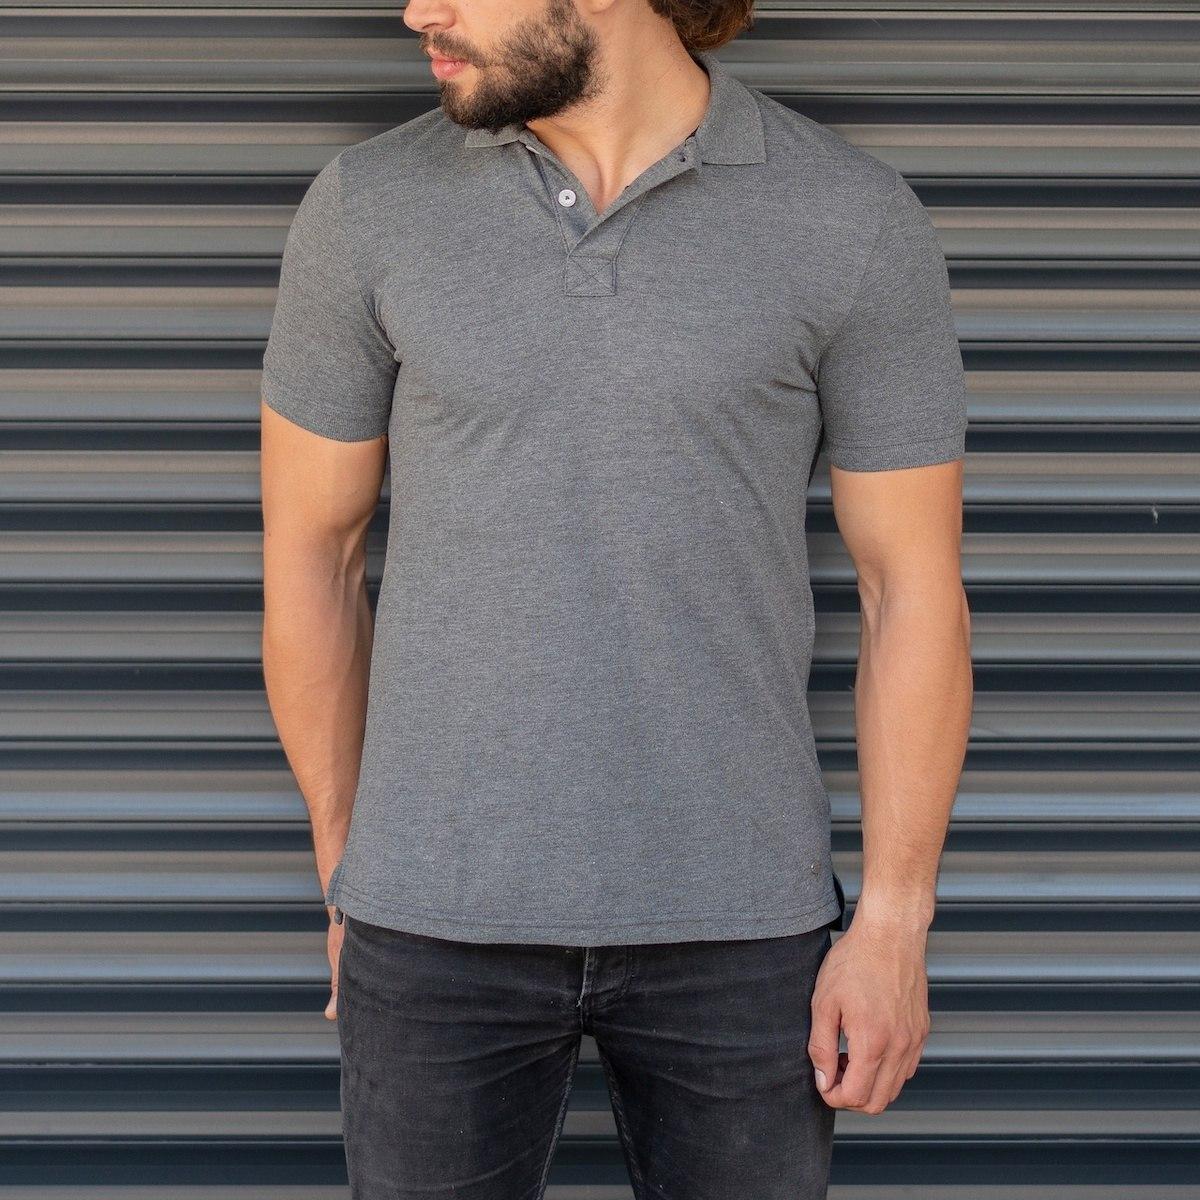 Men's Classic Slim Fit Longline Polo T-Shirt Gray